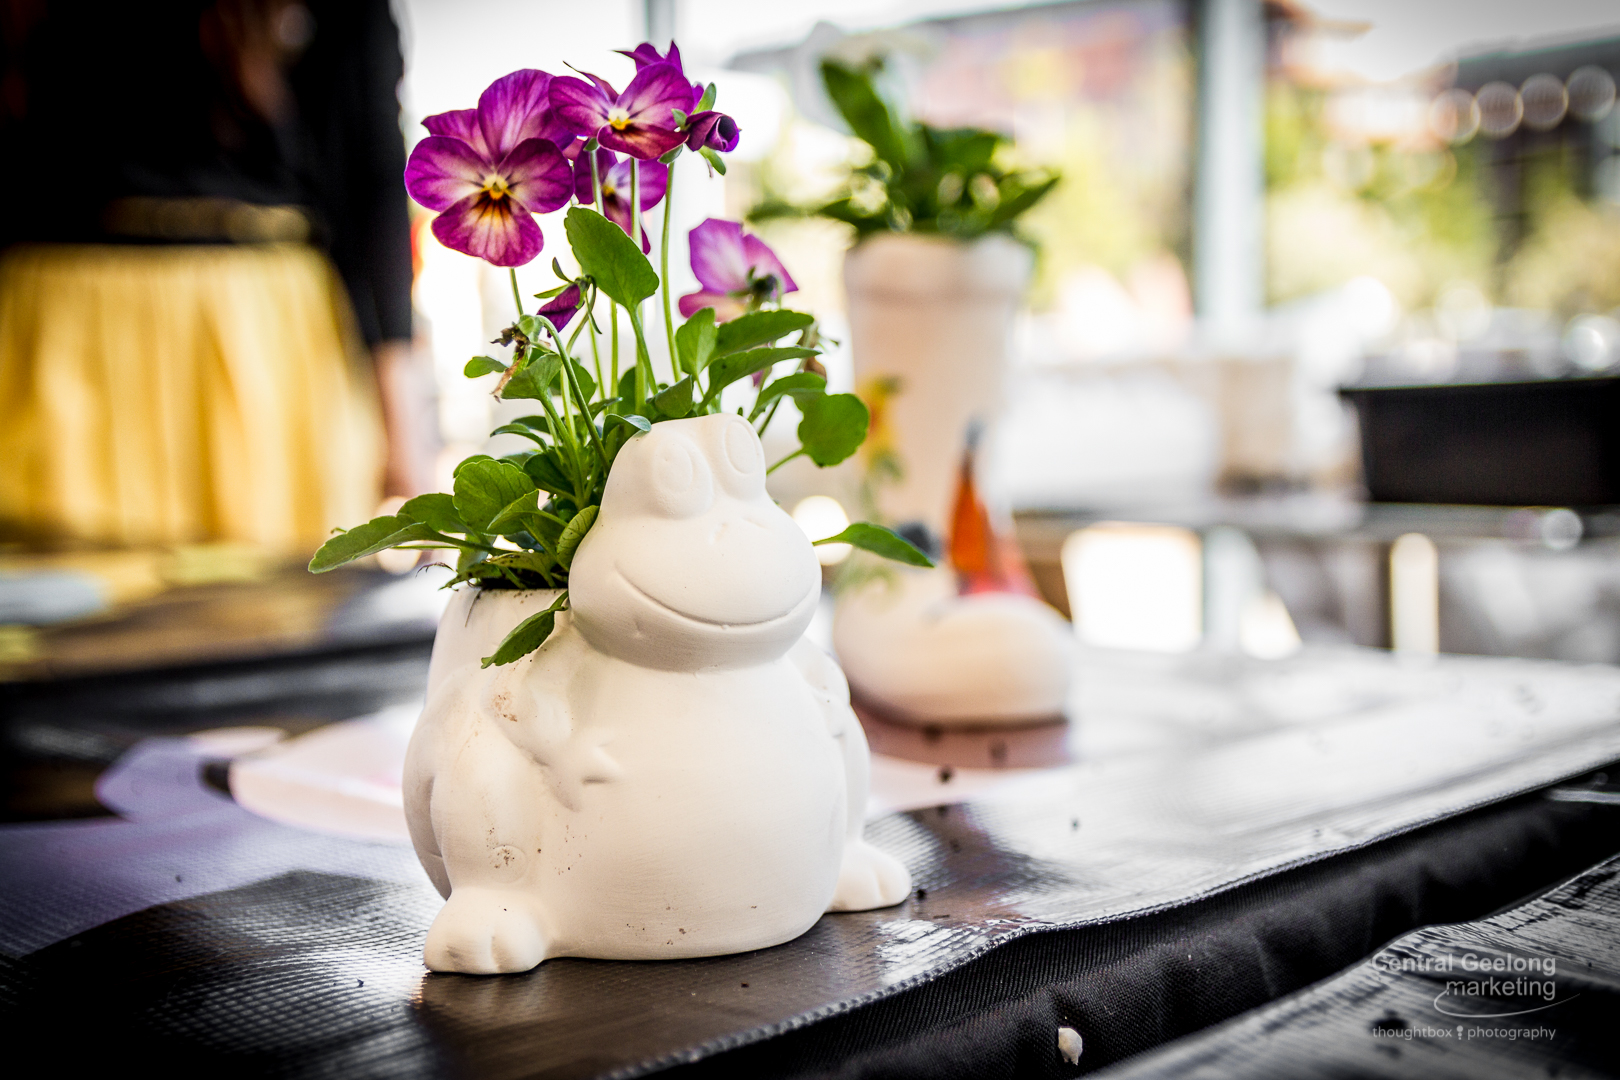 ceramic-frog-planting-workshop-event-the-party-girl.jpg